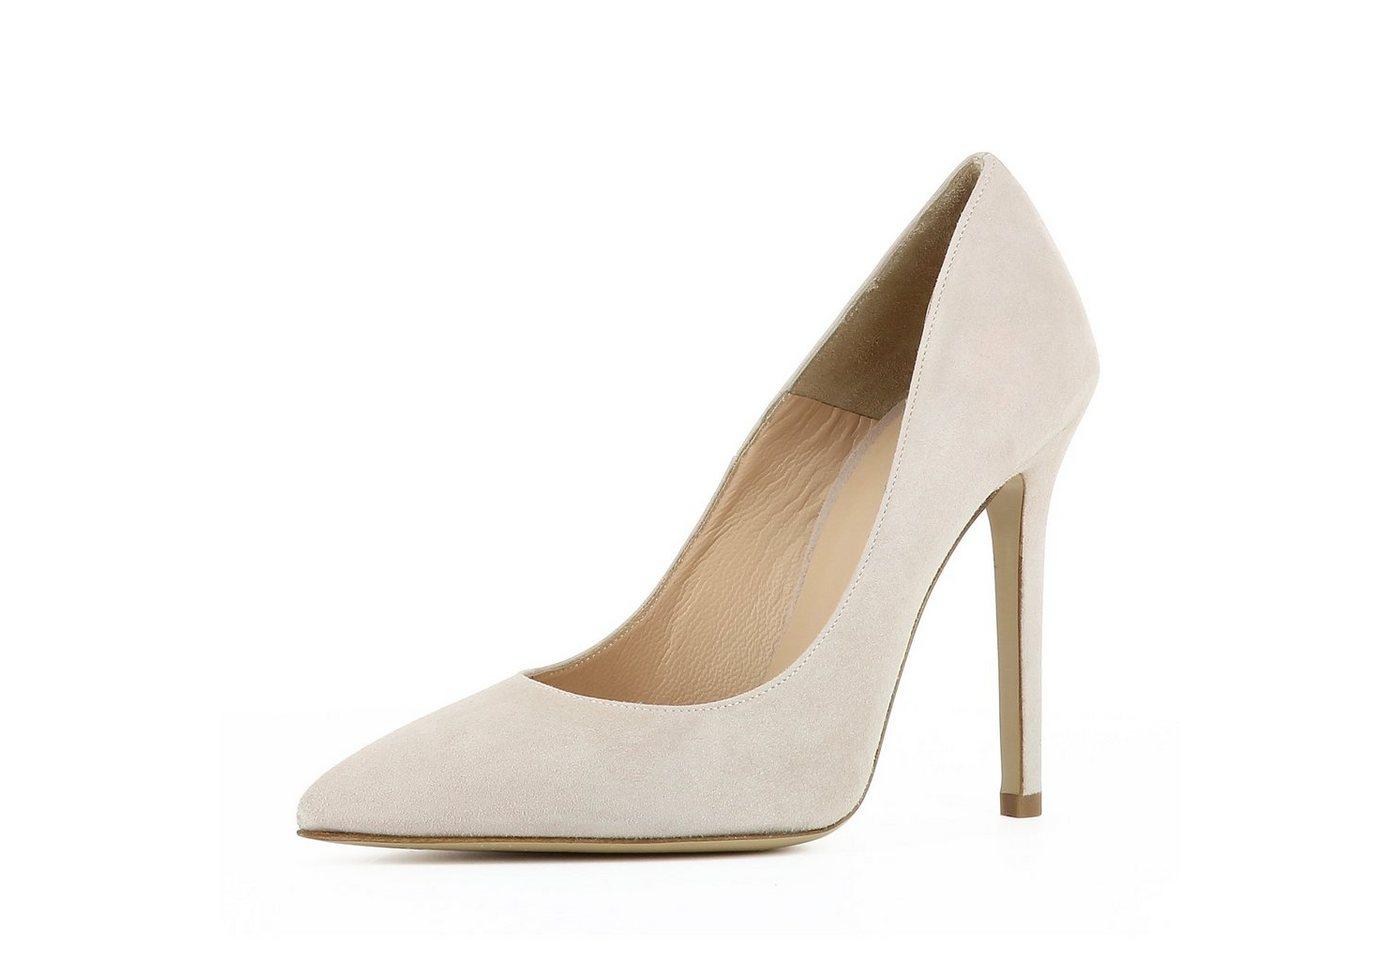 Evita »MIA« High-Heel-Pumps | Schuhe > High Heels > High Heel Pumps | Rosa | Evita